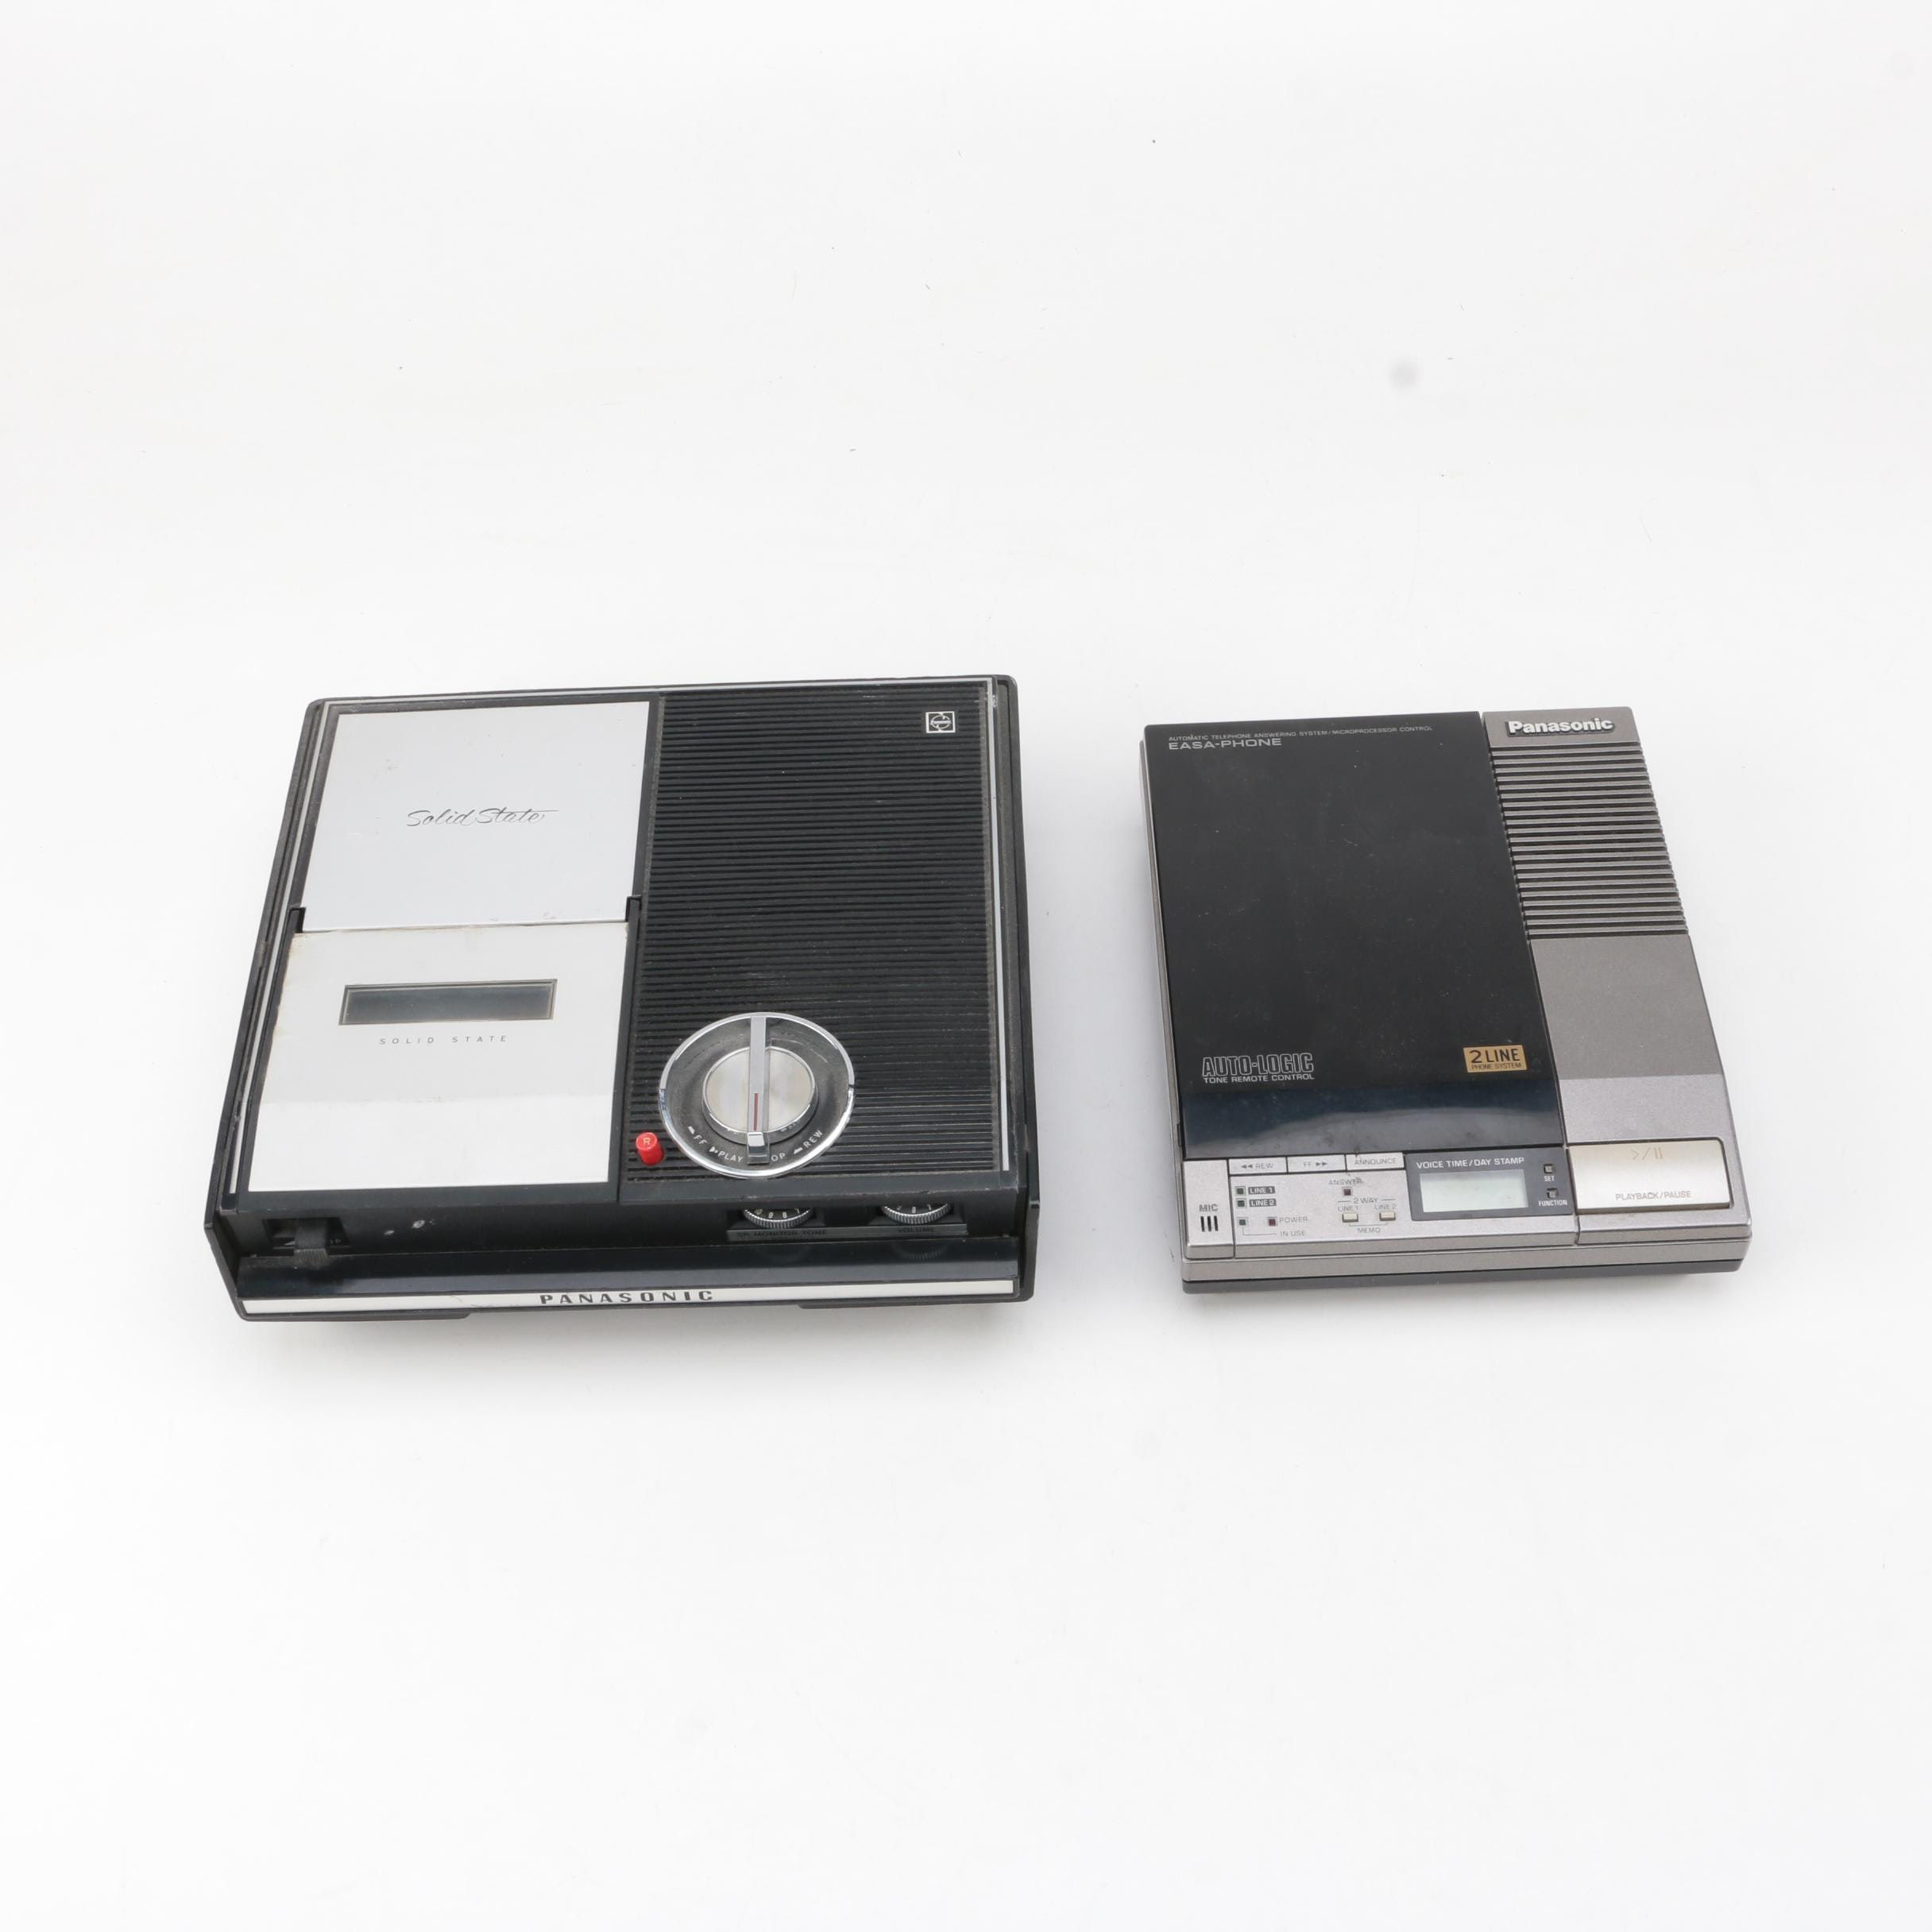 Vintage Panasonic and Auto-Logic Answering Machines